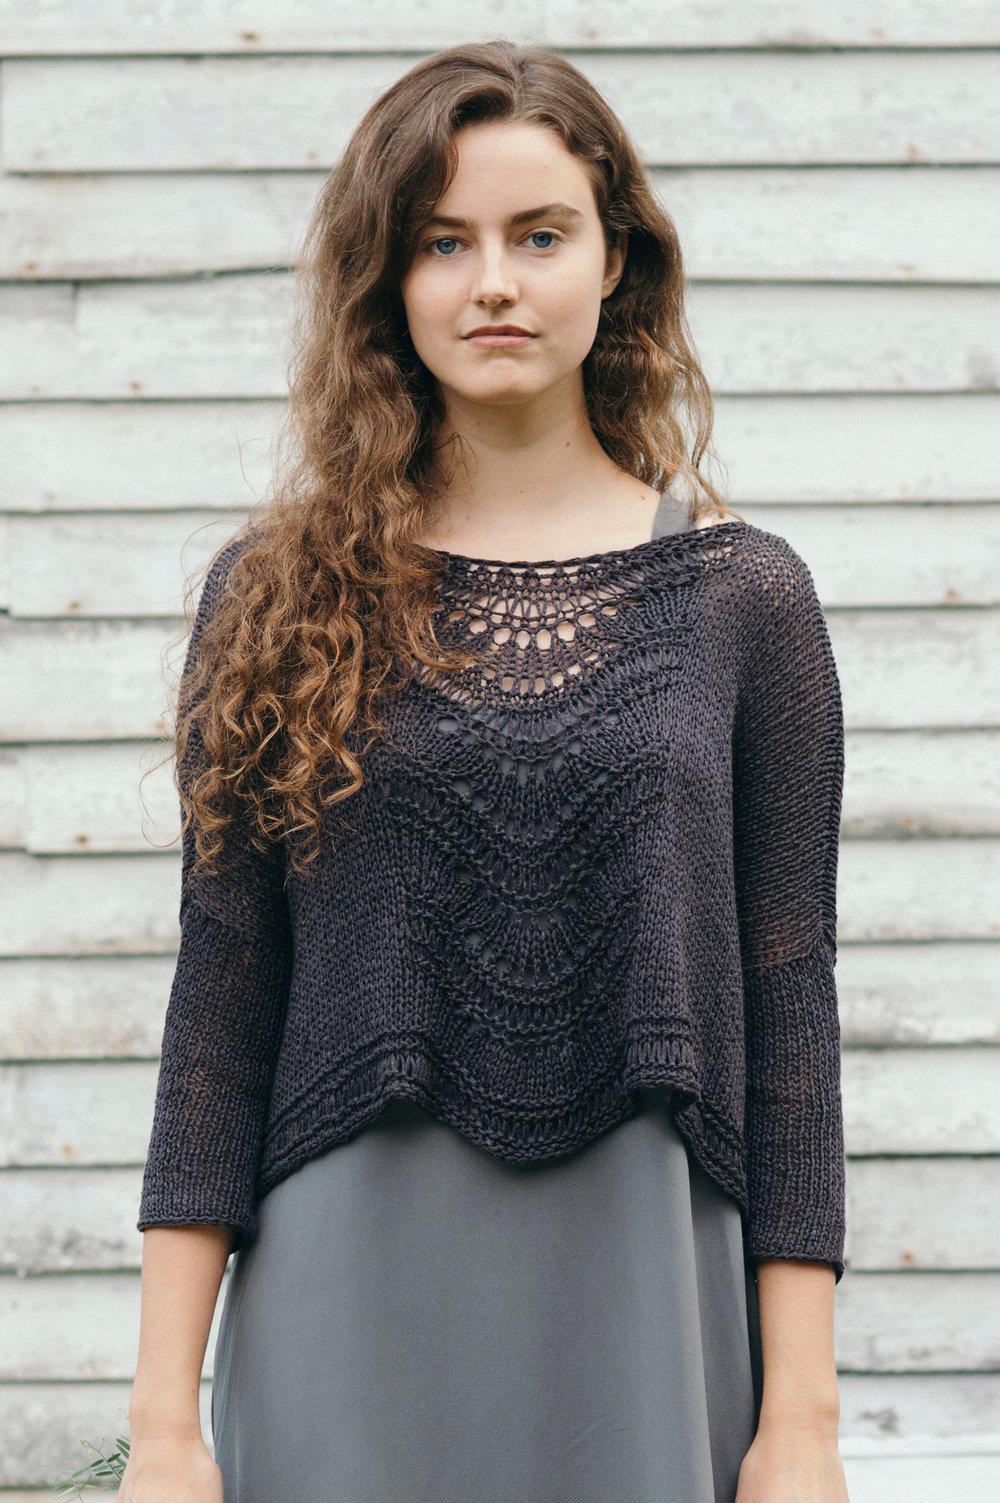 quince-co-deschain-leila-raabe-knitting-pattern-kestrel-1.jpg